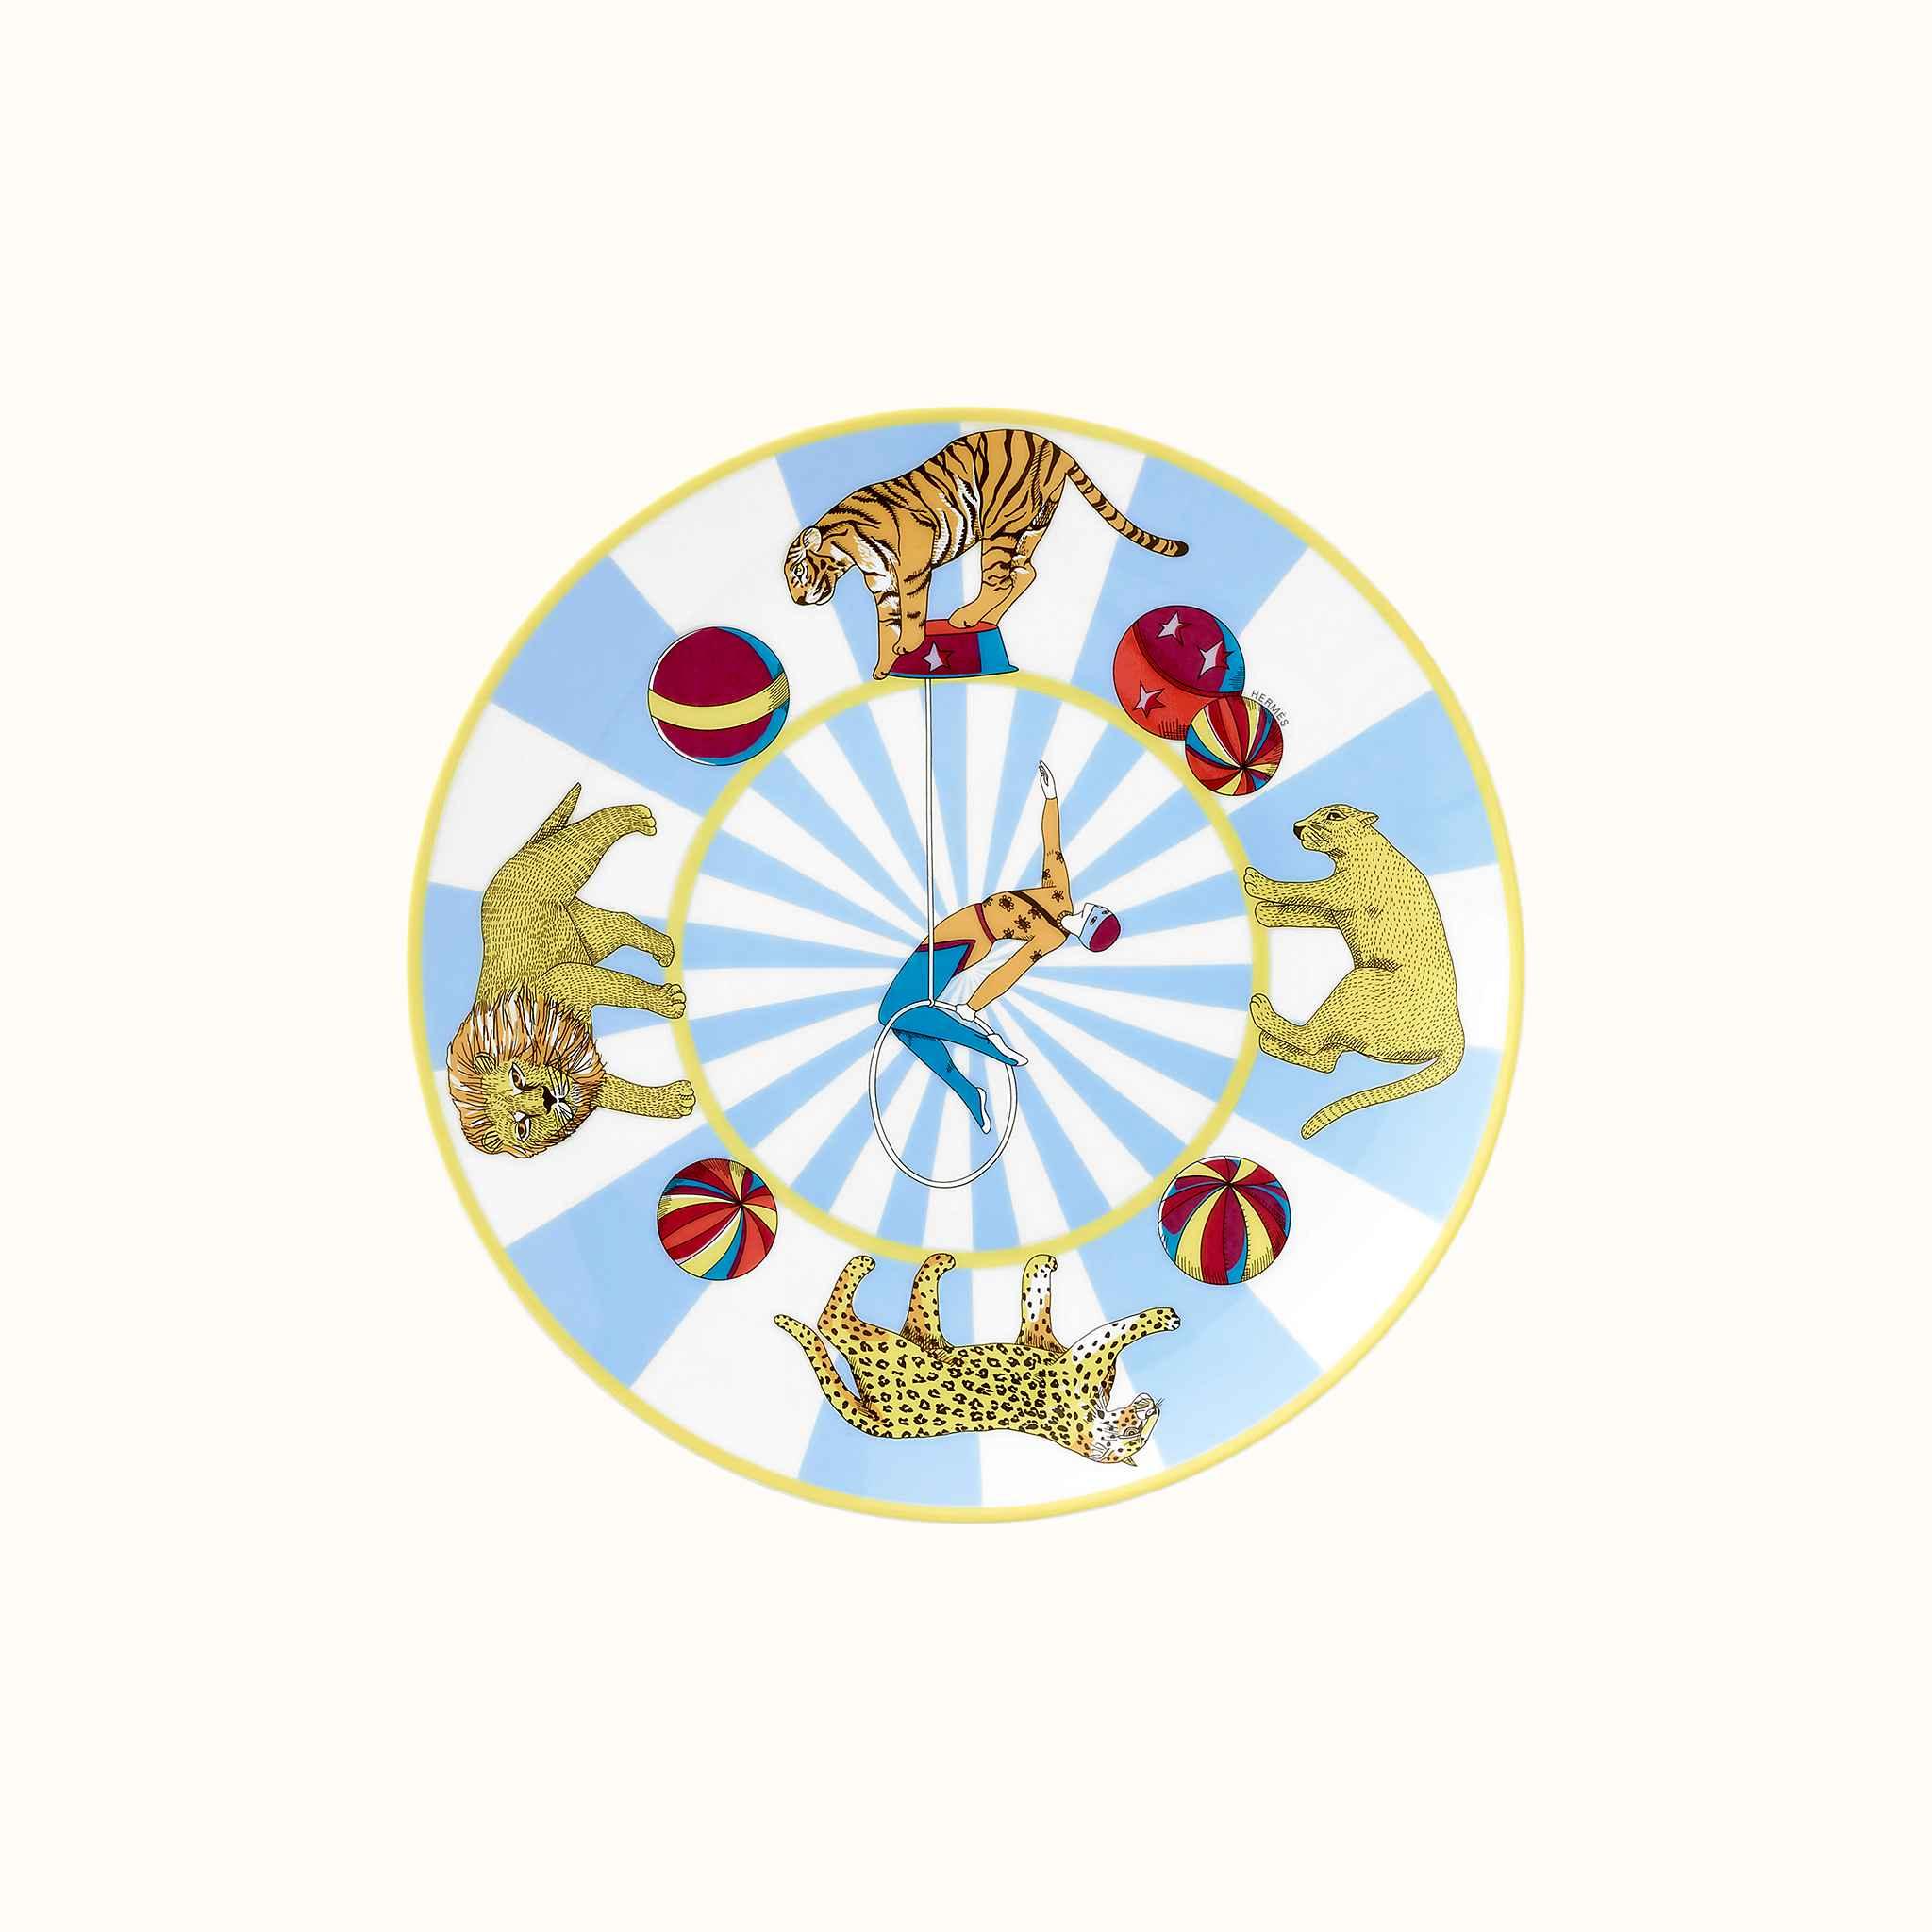 Hermes Circus dessert plate